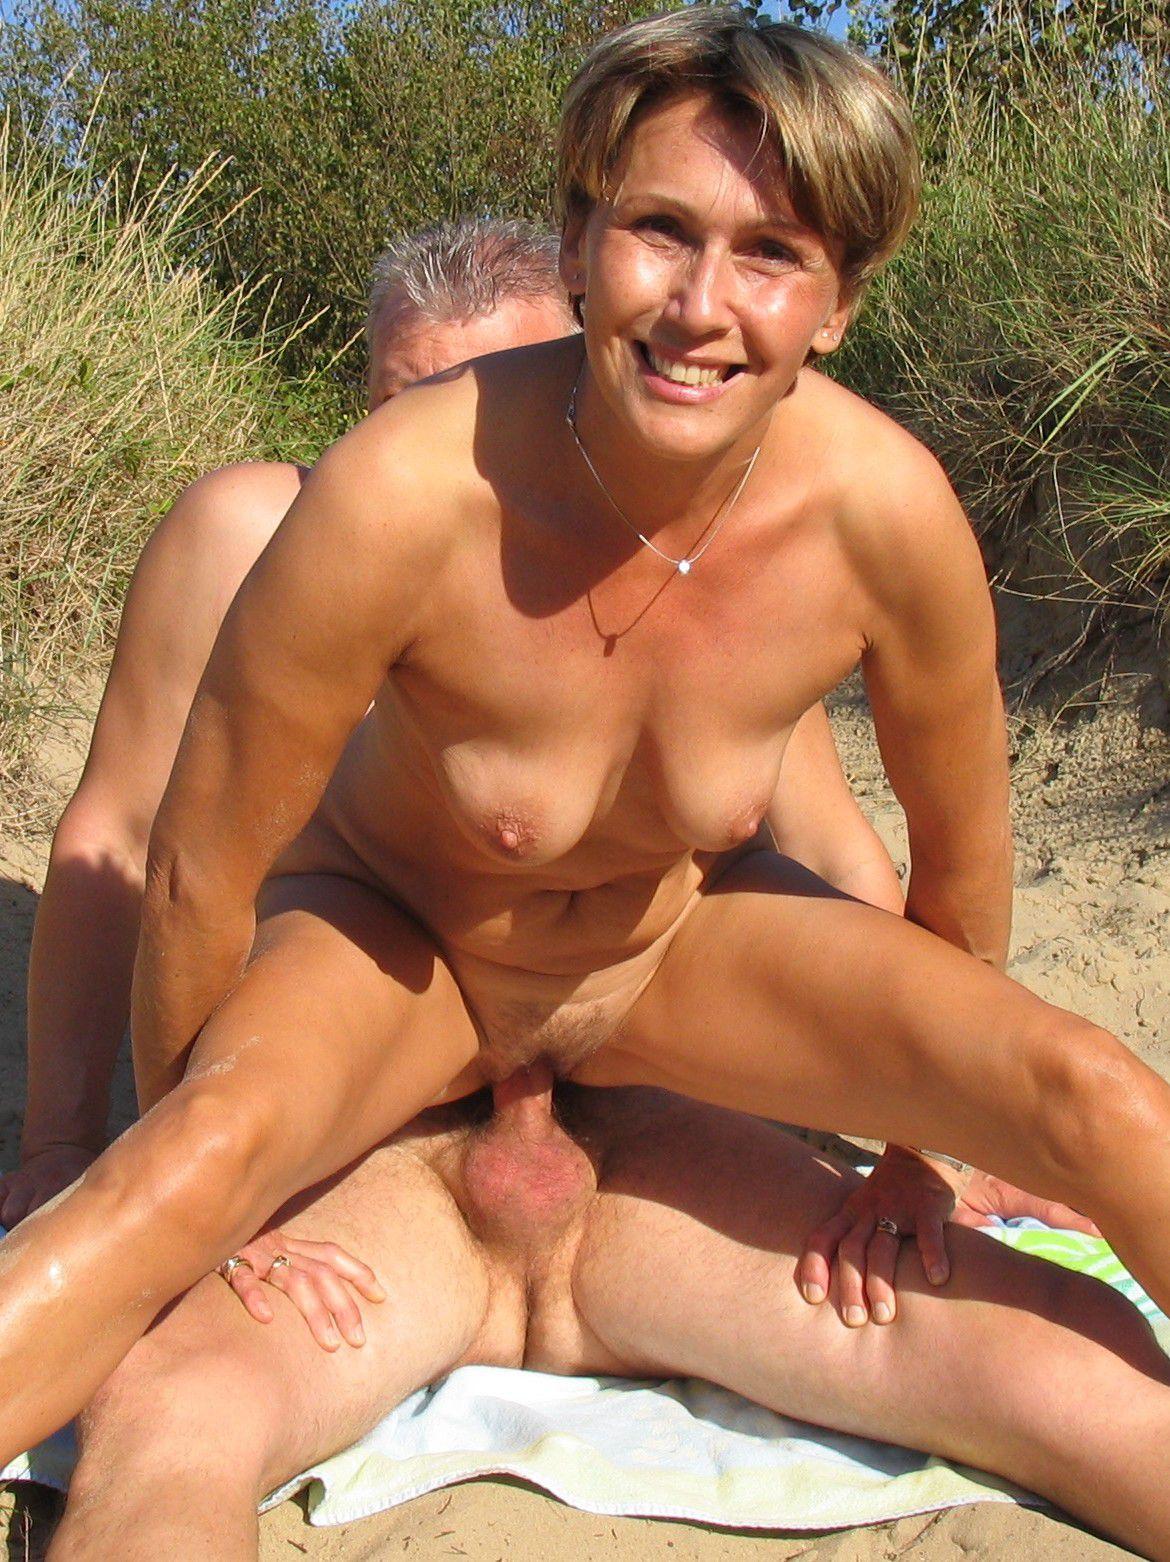 Nude pic community